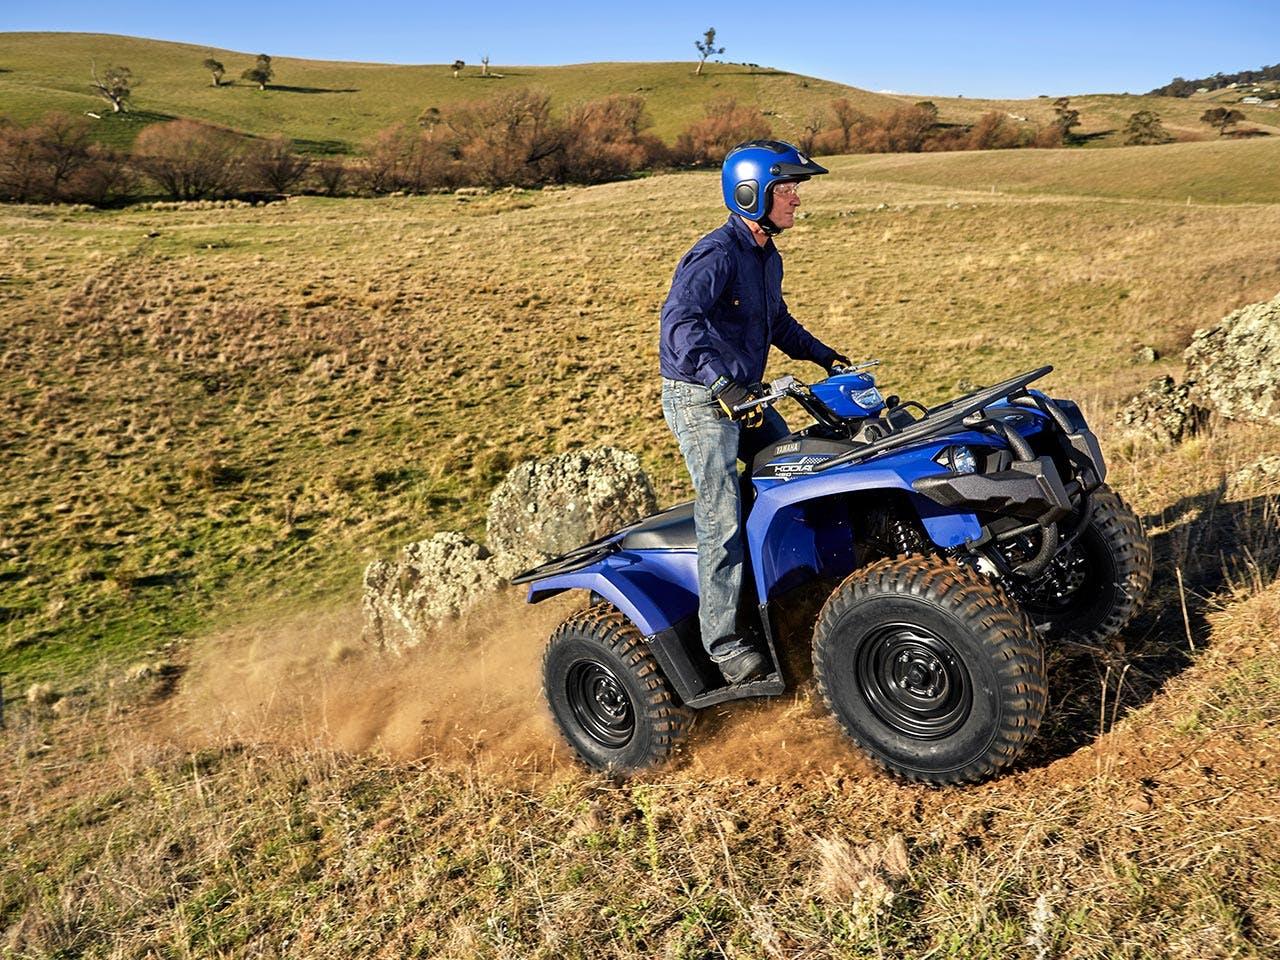 Yamaha Kodiak 450 EPS riding on a dirt track